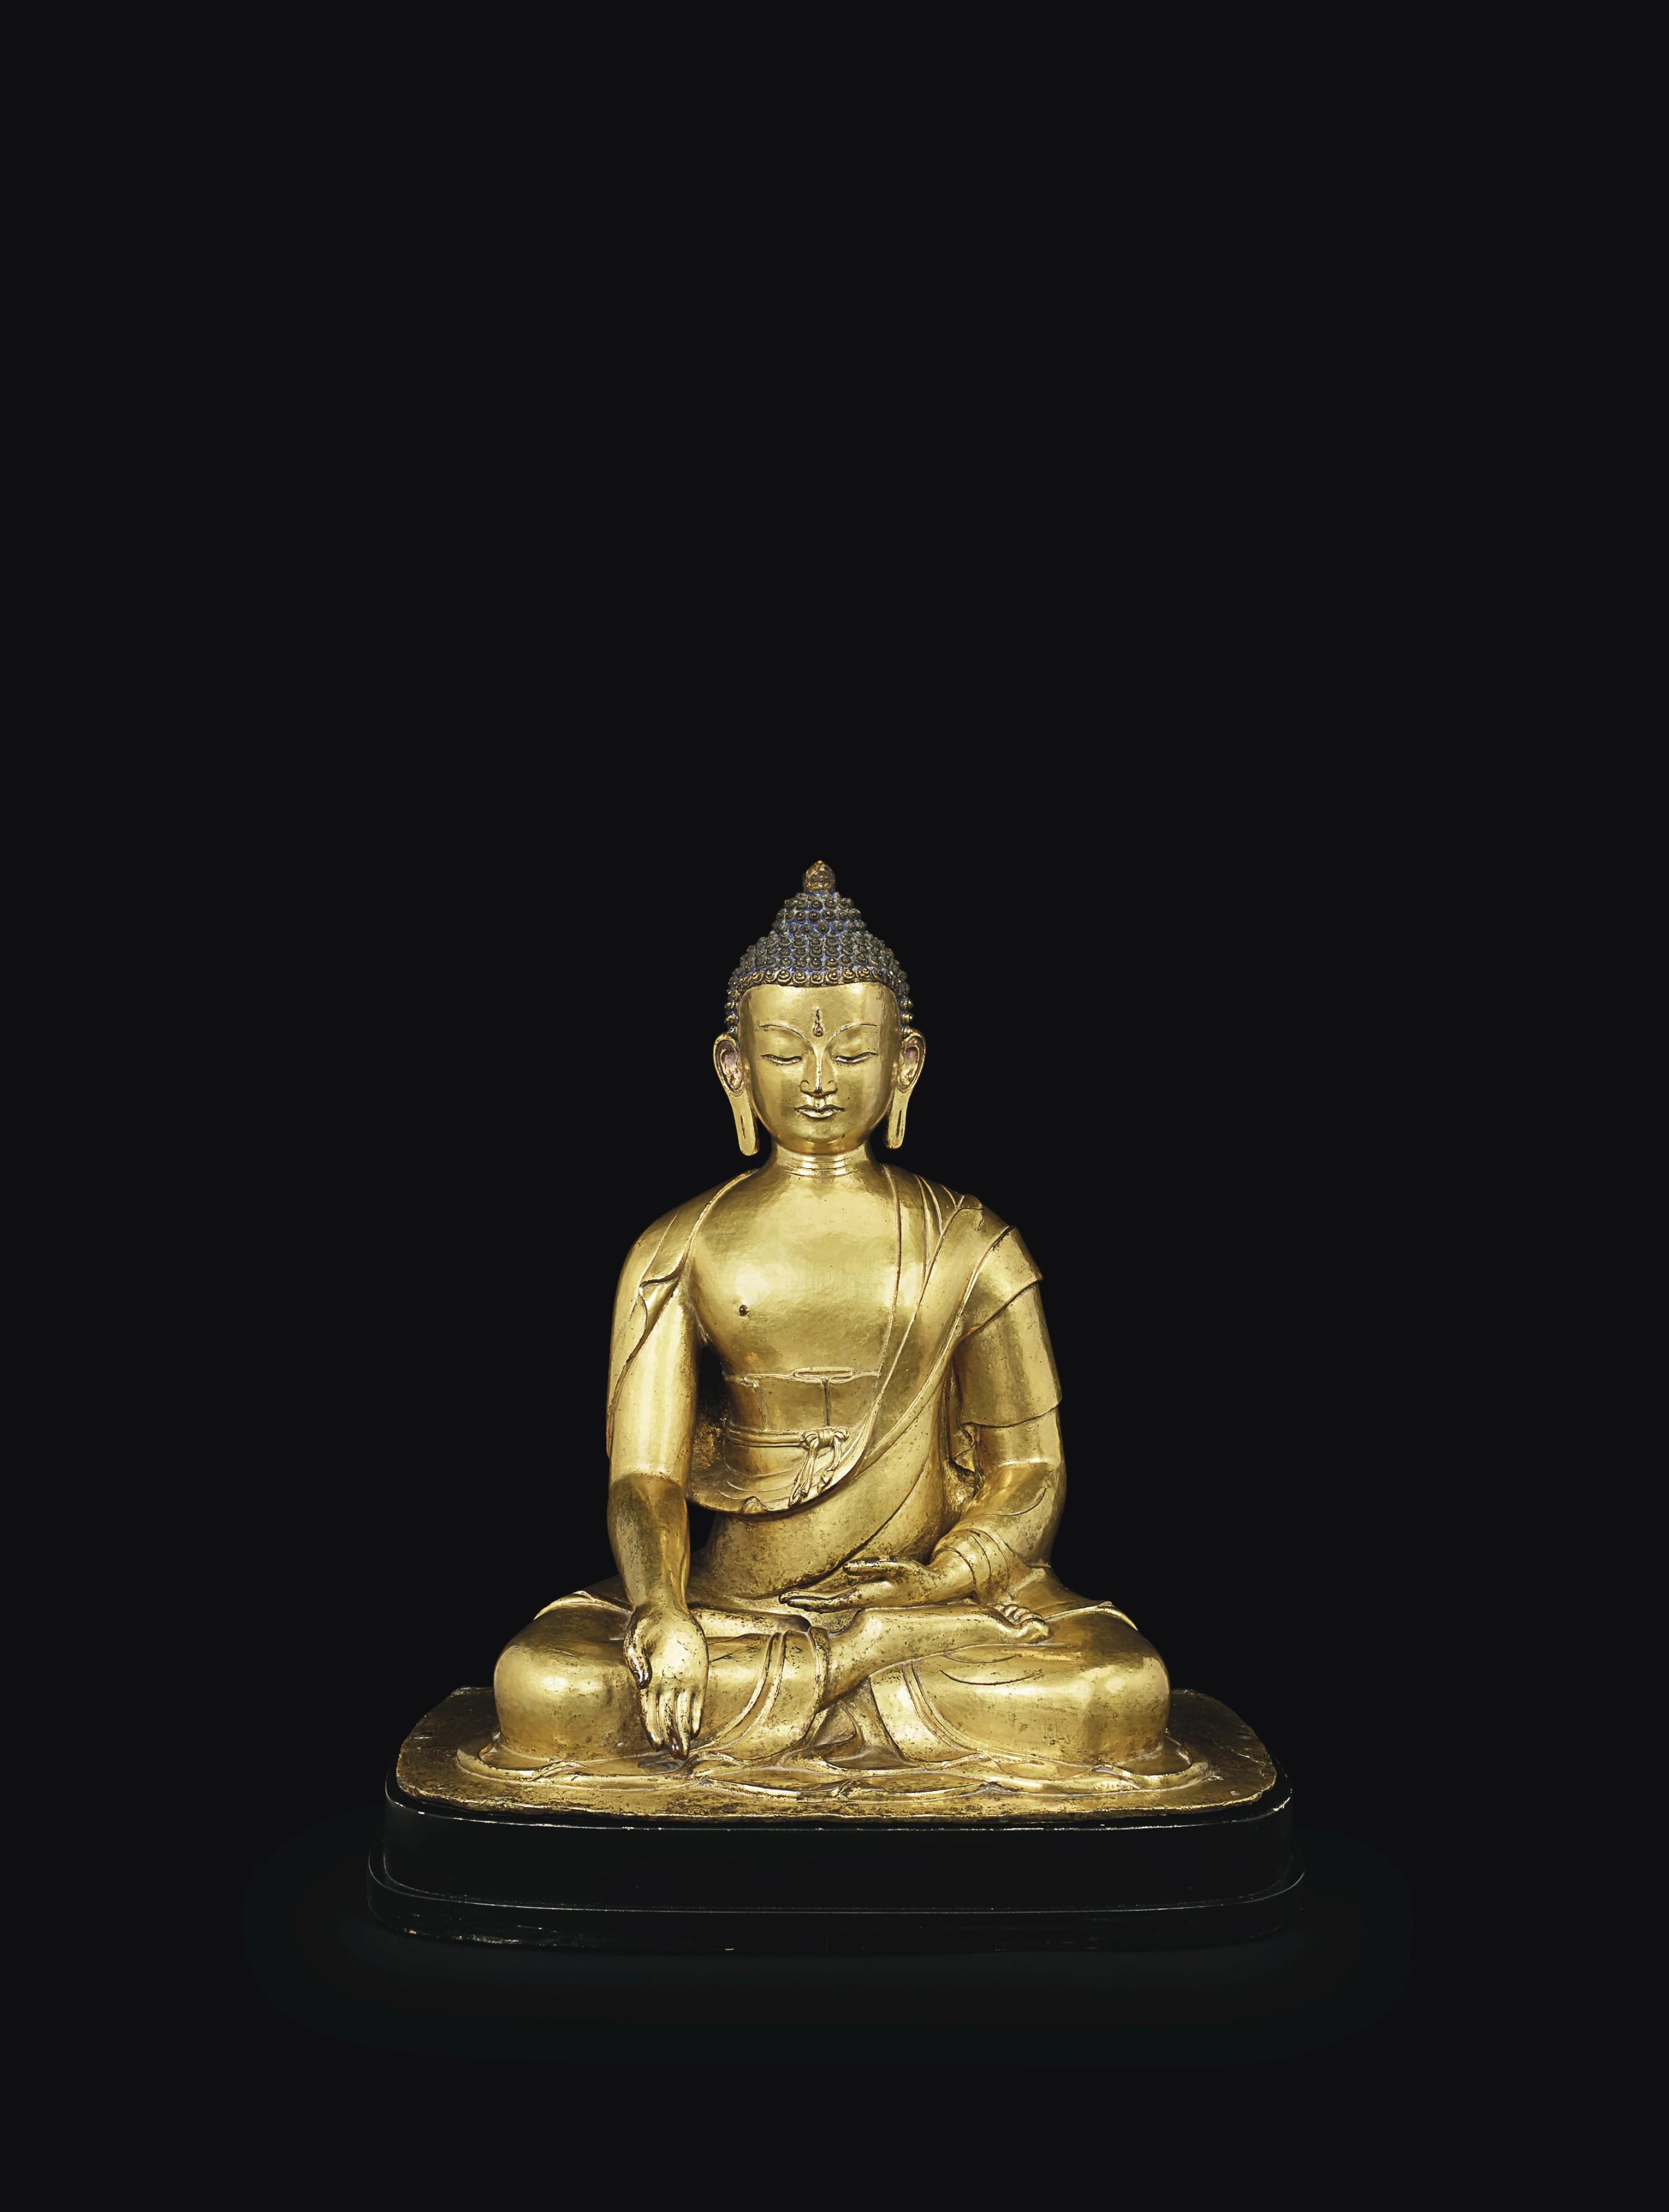 A RARE GILT-BRONZE FIGURE OF BUDDHA RATNASAMBHAVA